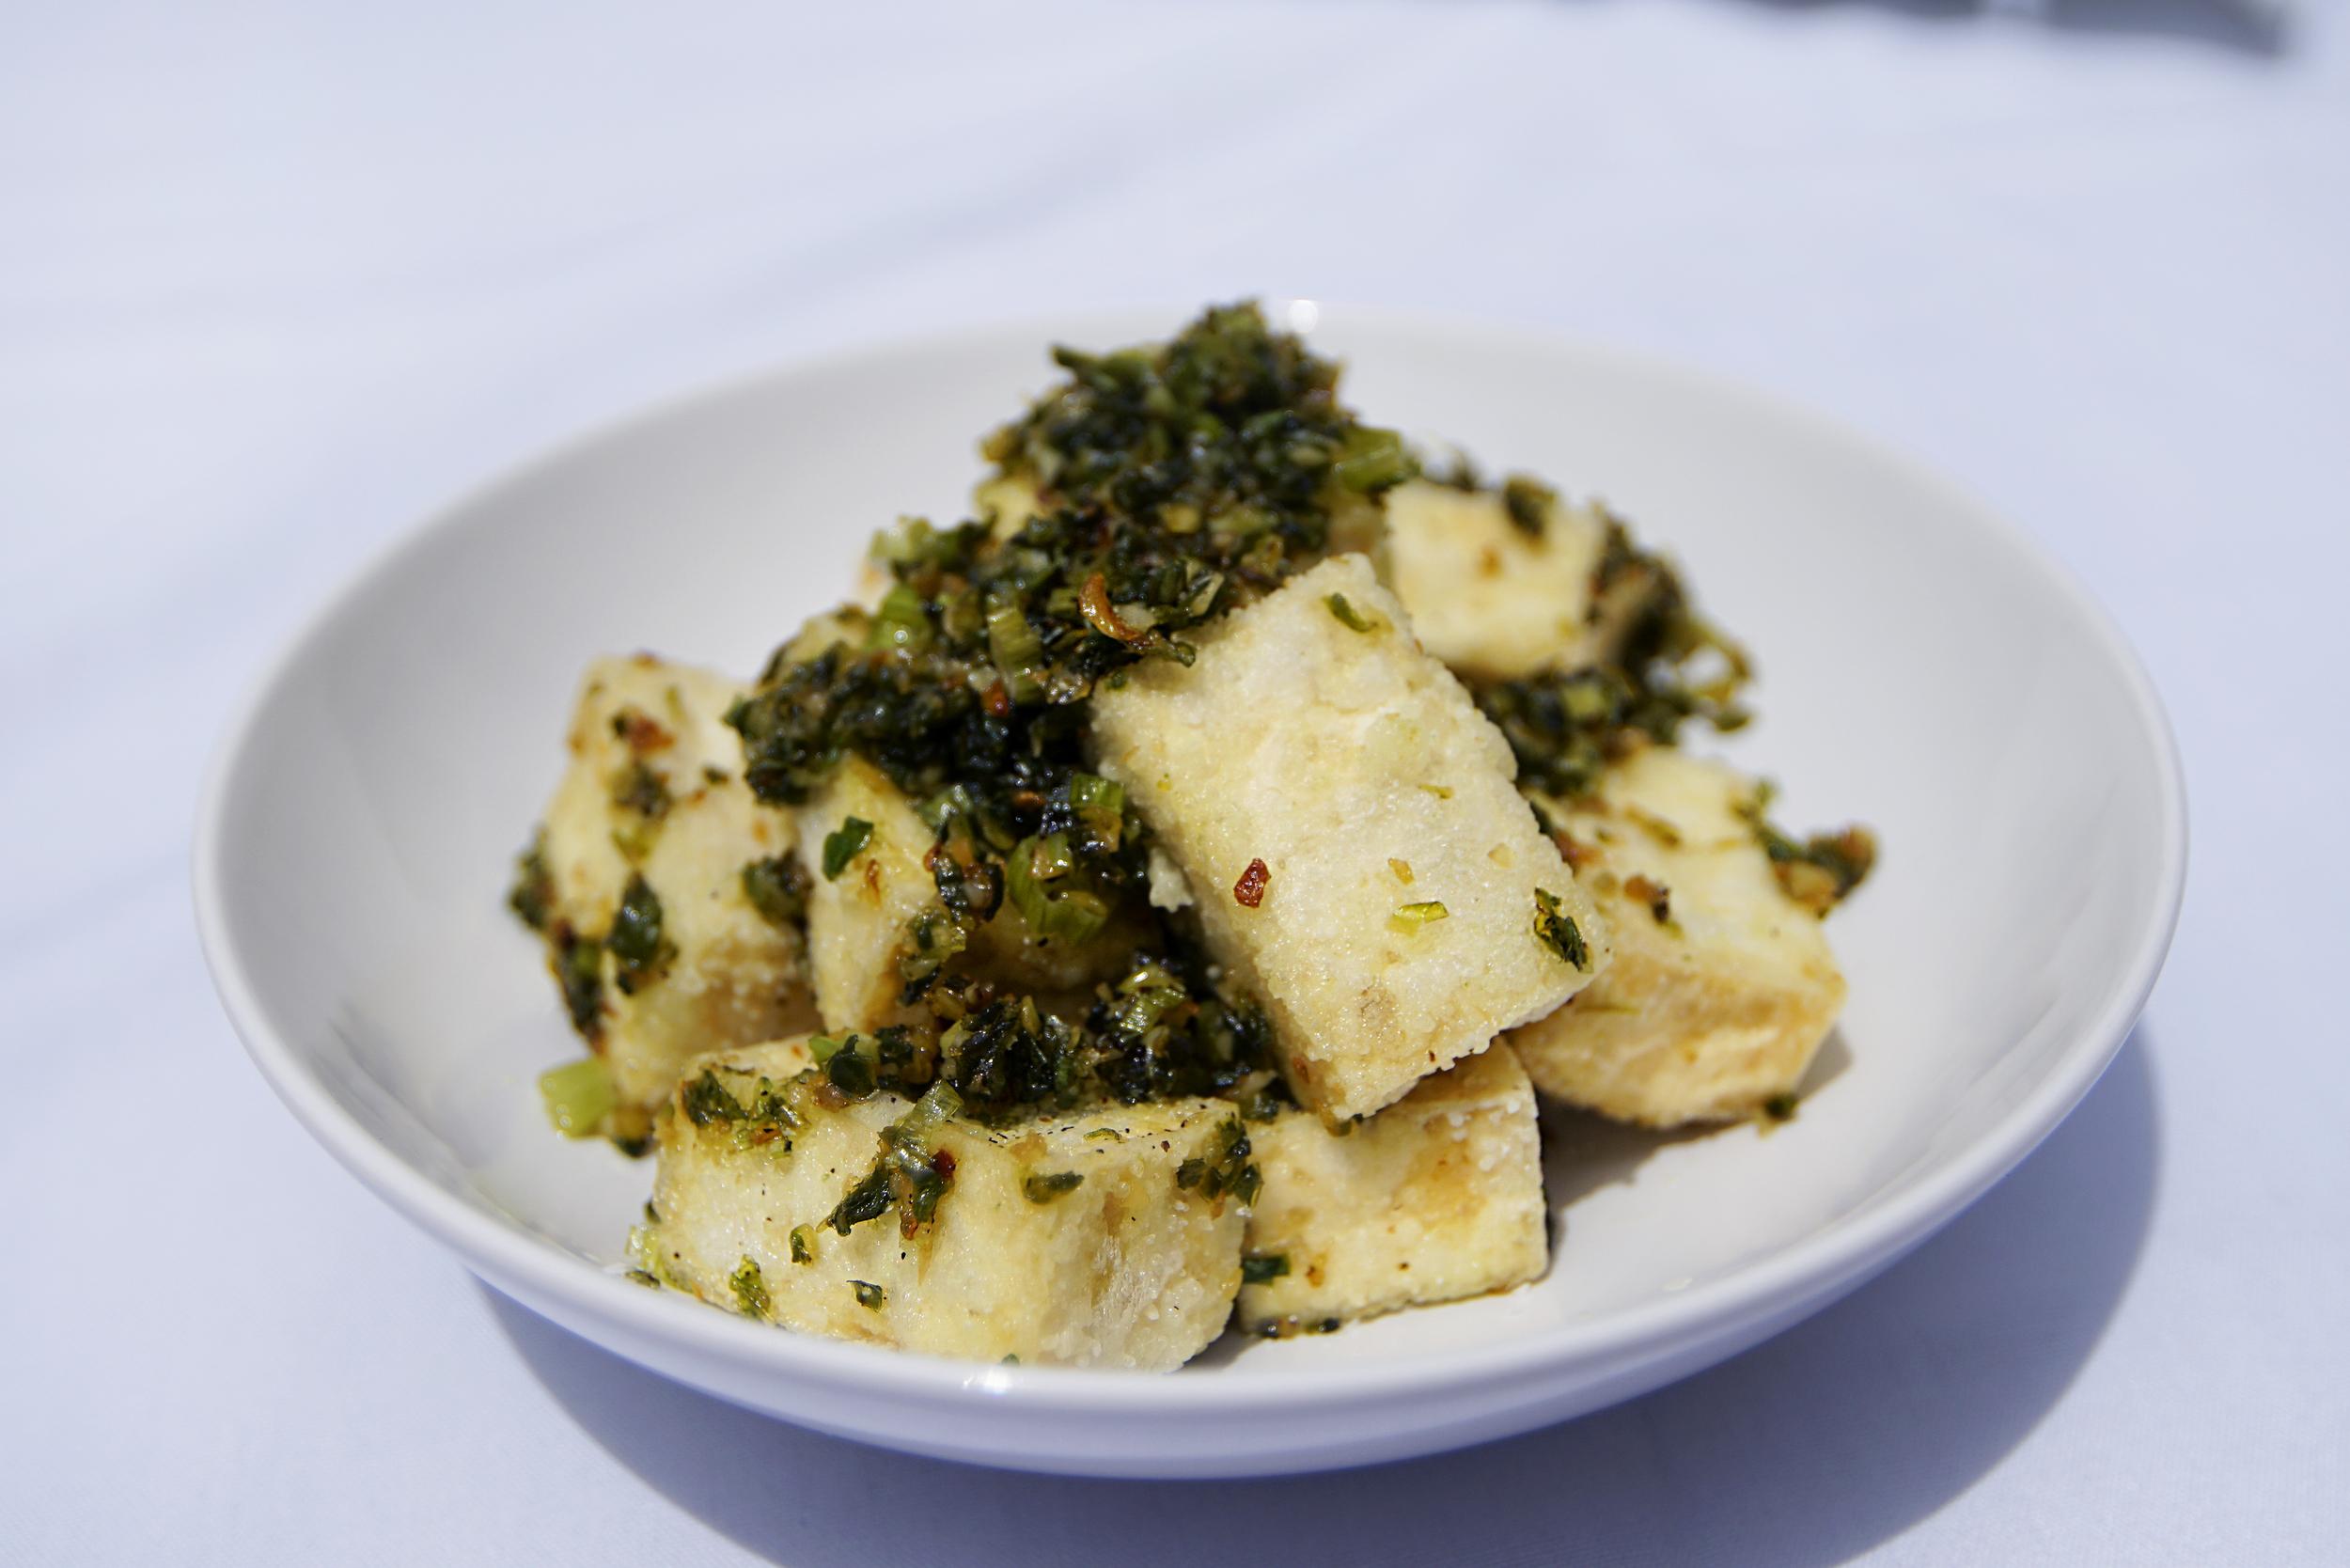 Jalapeño Salt and Pepper Tofu